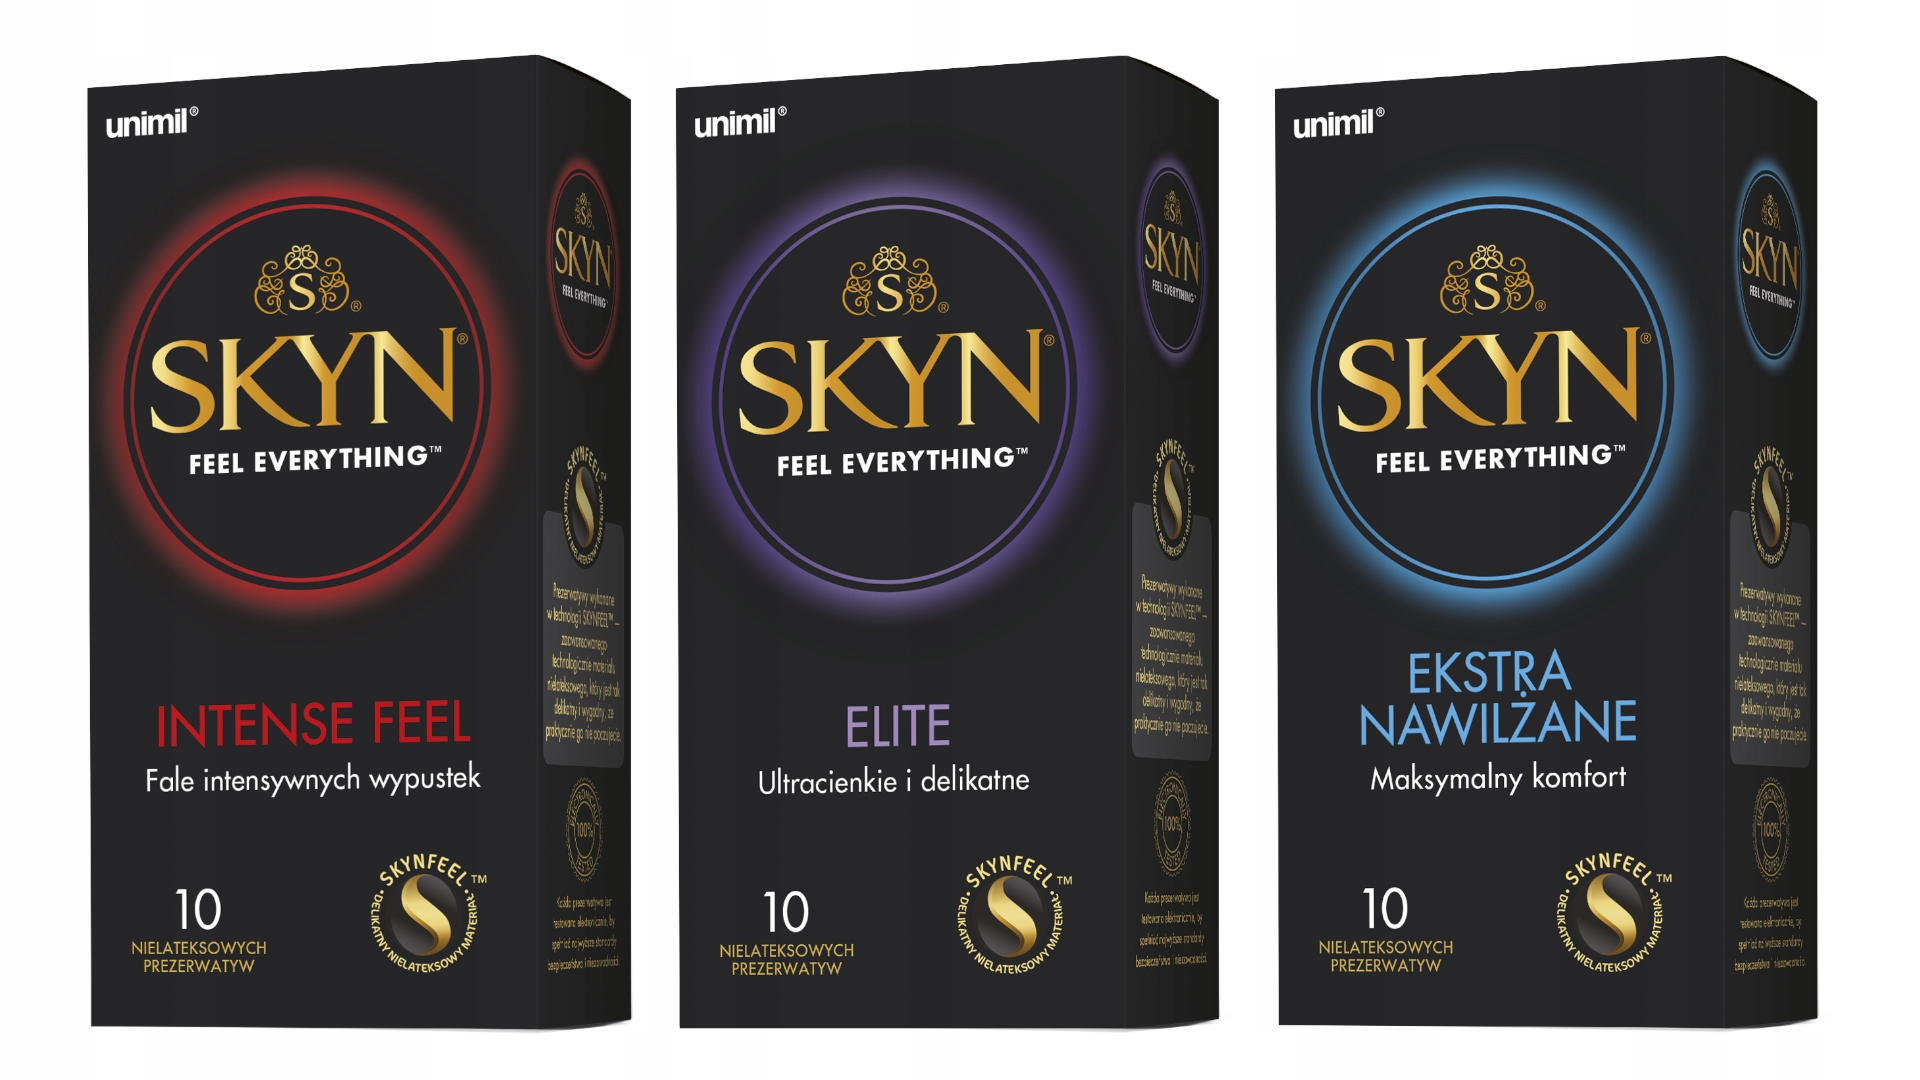 Item Condoms Unimil Skyn Set Of 30 Different Types